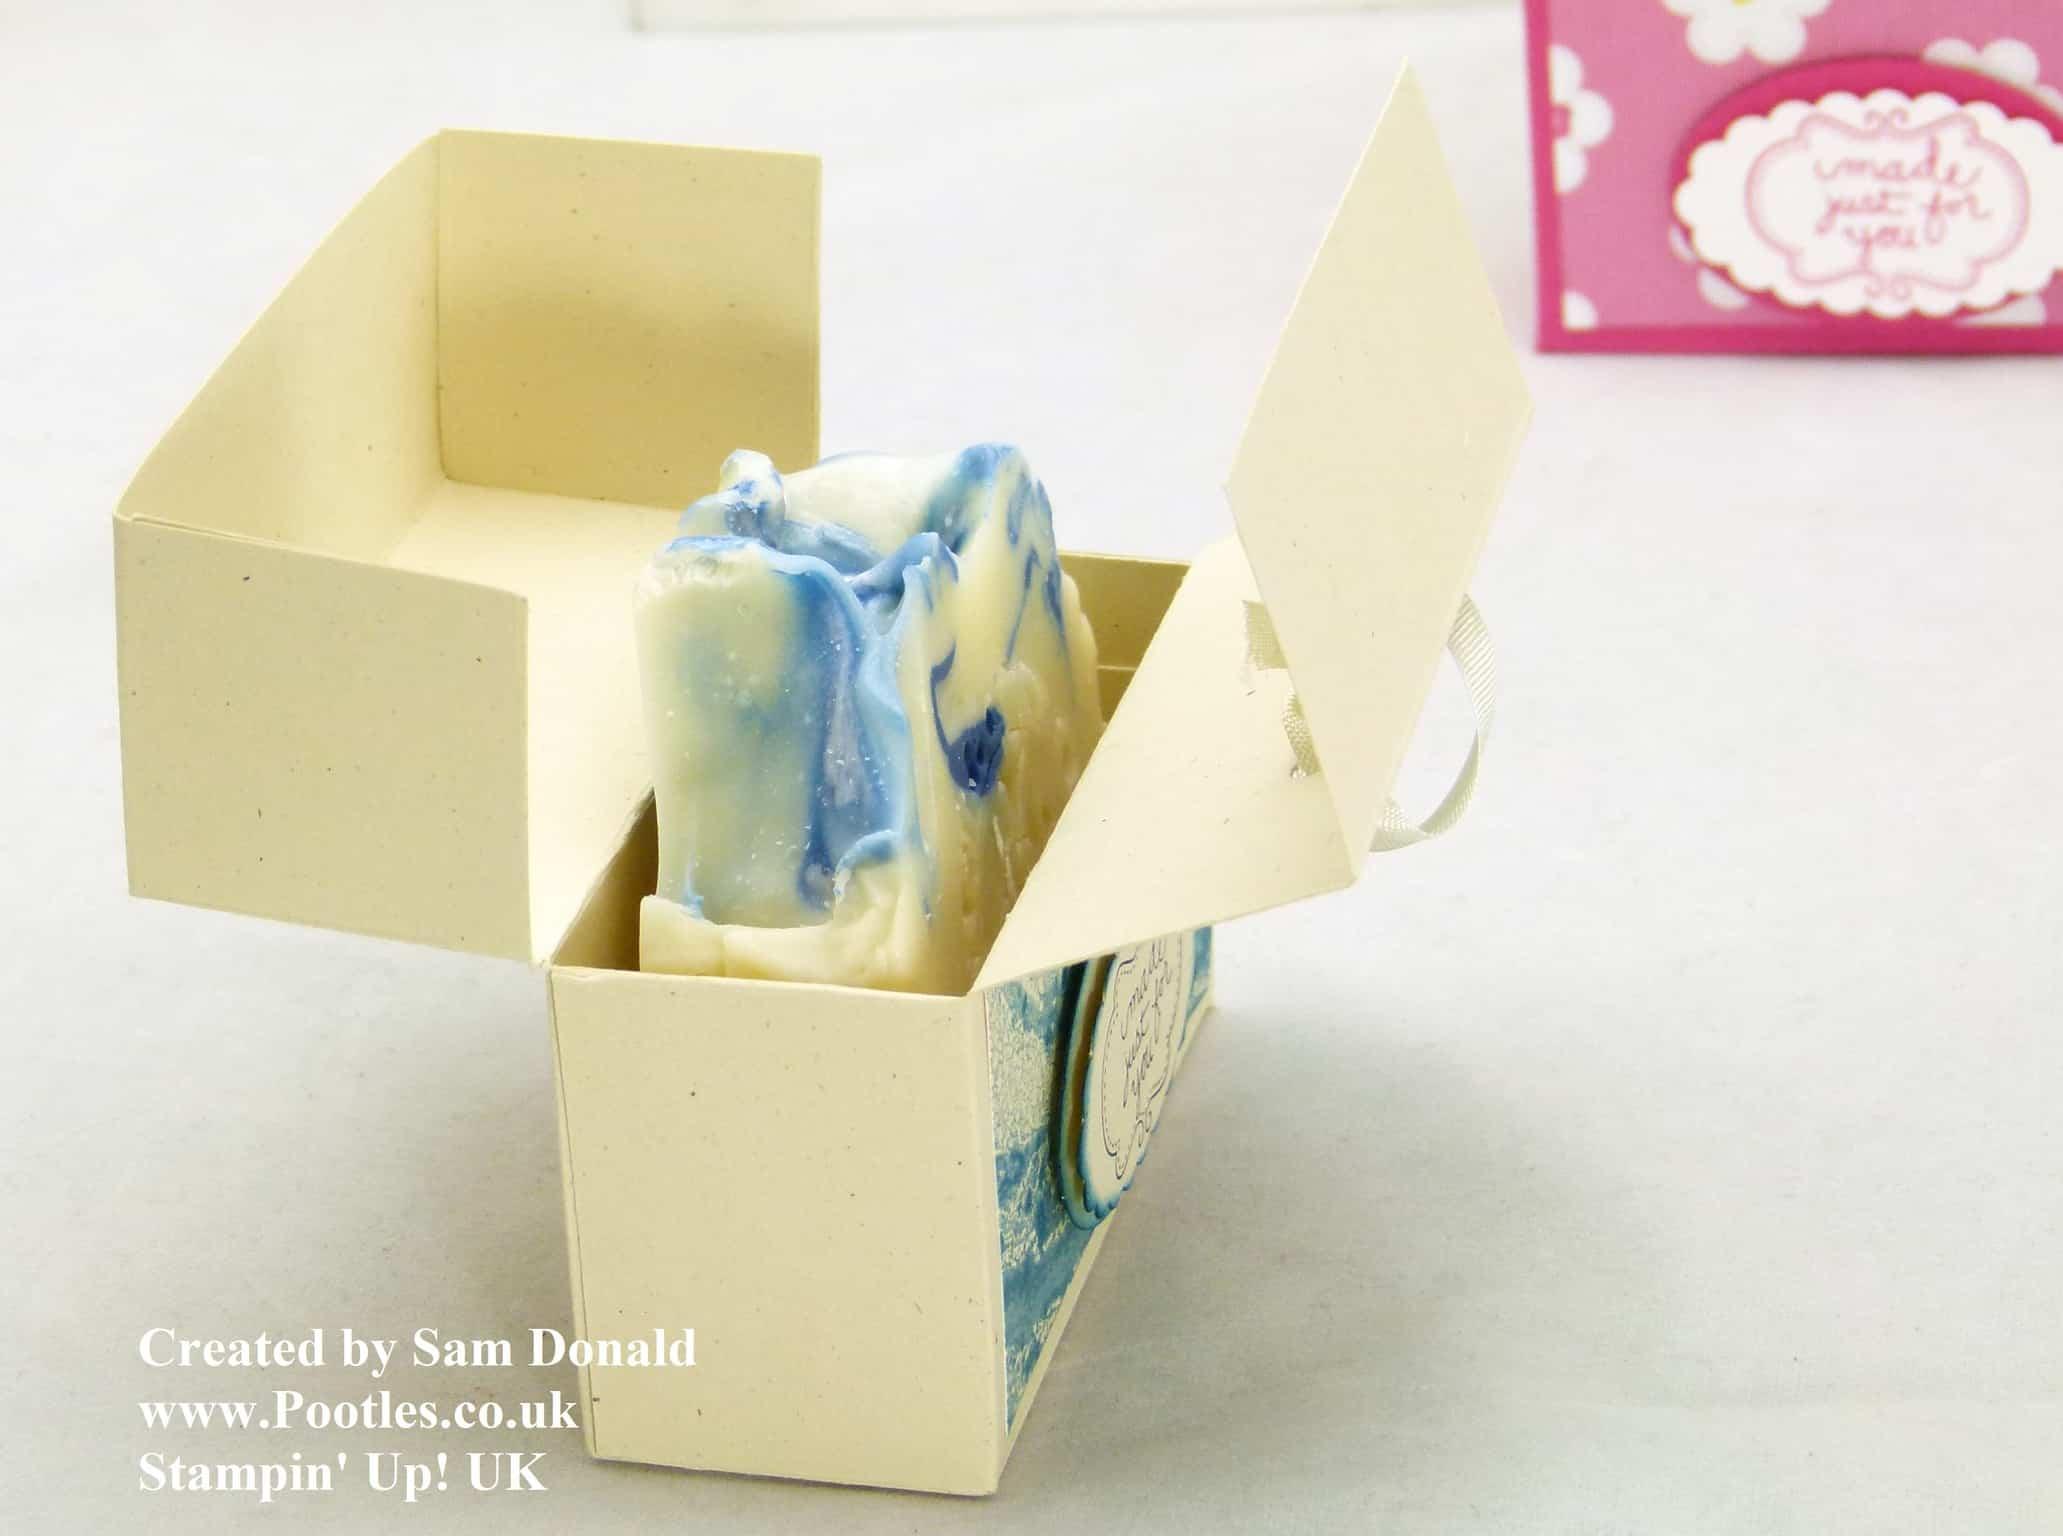 Pootles Stampin Up UK Soap and Card Box Tutorial 3